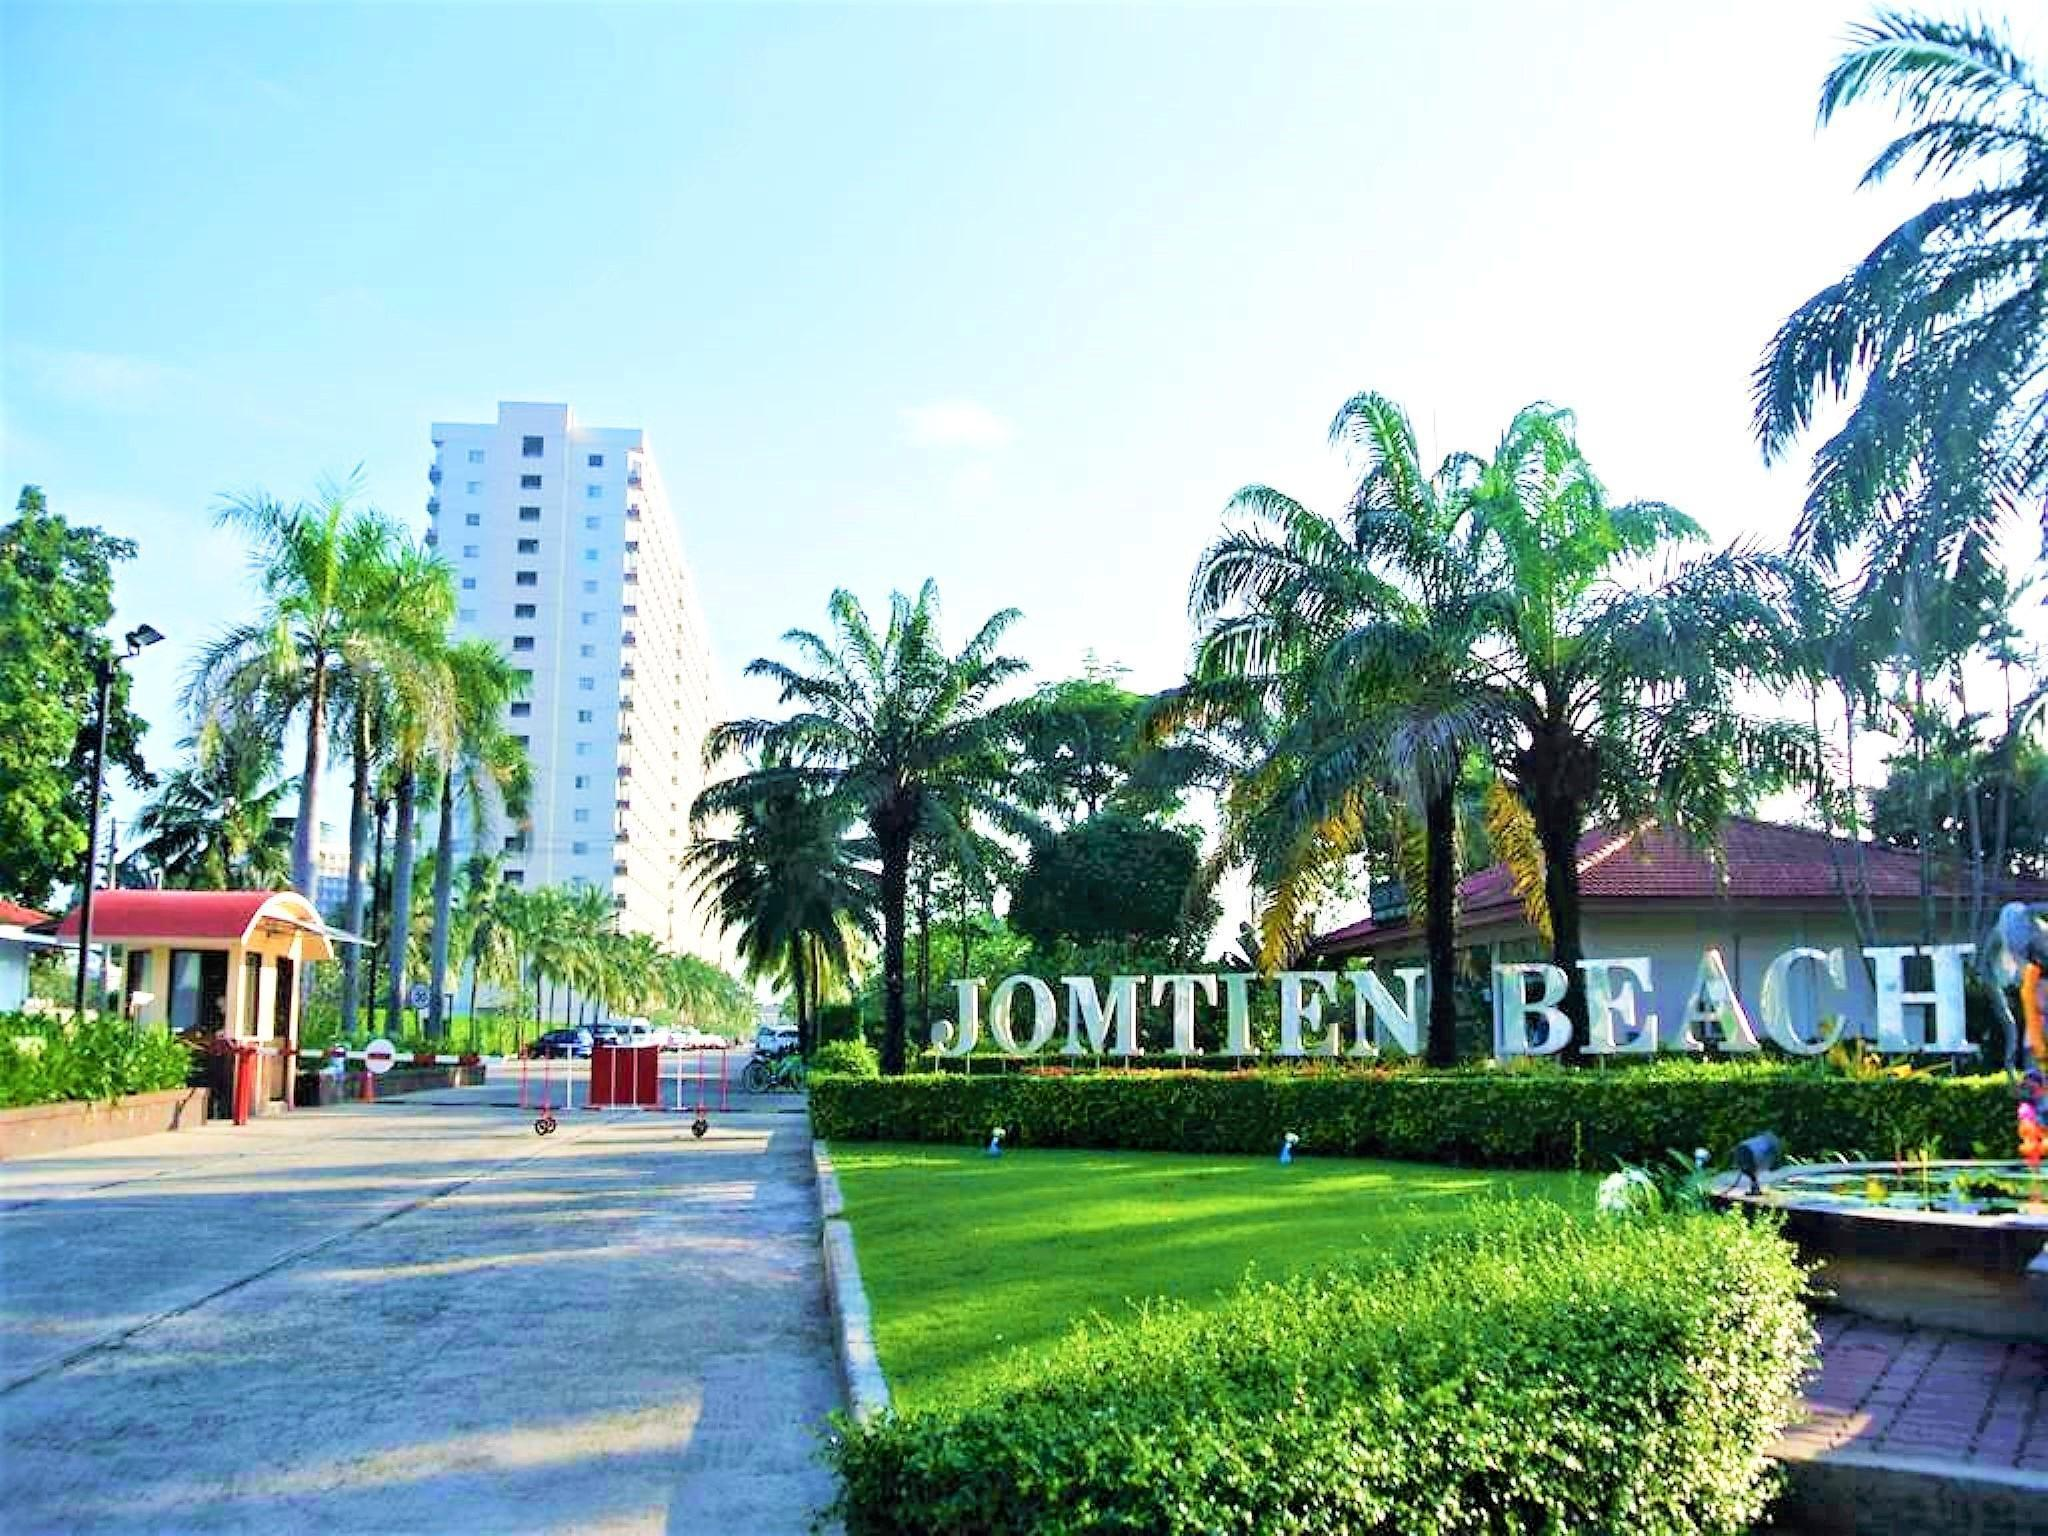 Jacuzzi + Sea view Jomtien beach condo S1 อพาร์ตเมนต์ 1 ห้องนอน 1 ห้องน้ำส่วนตัว ขนาด 68 ตร.ม. – หาดจอมเทียน